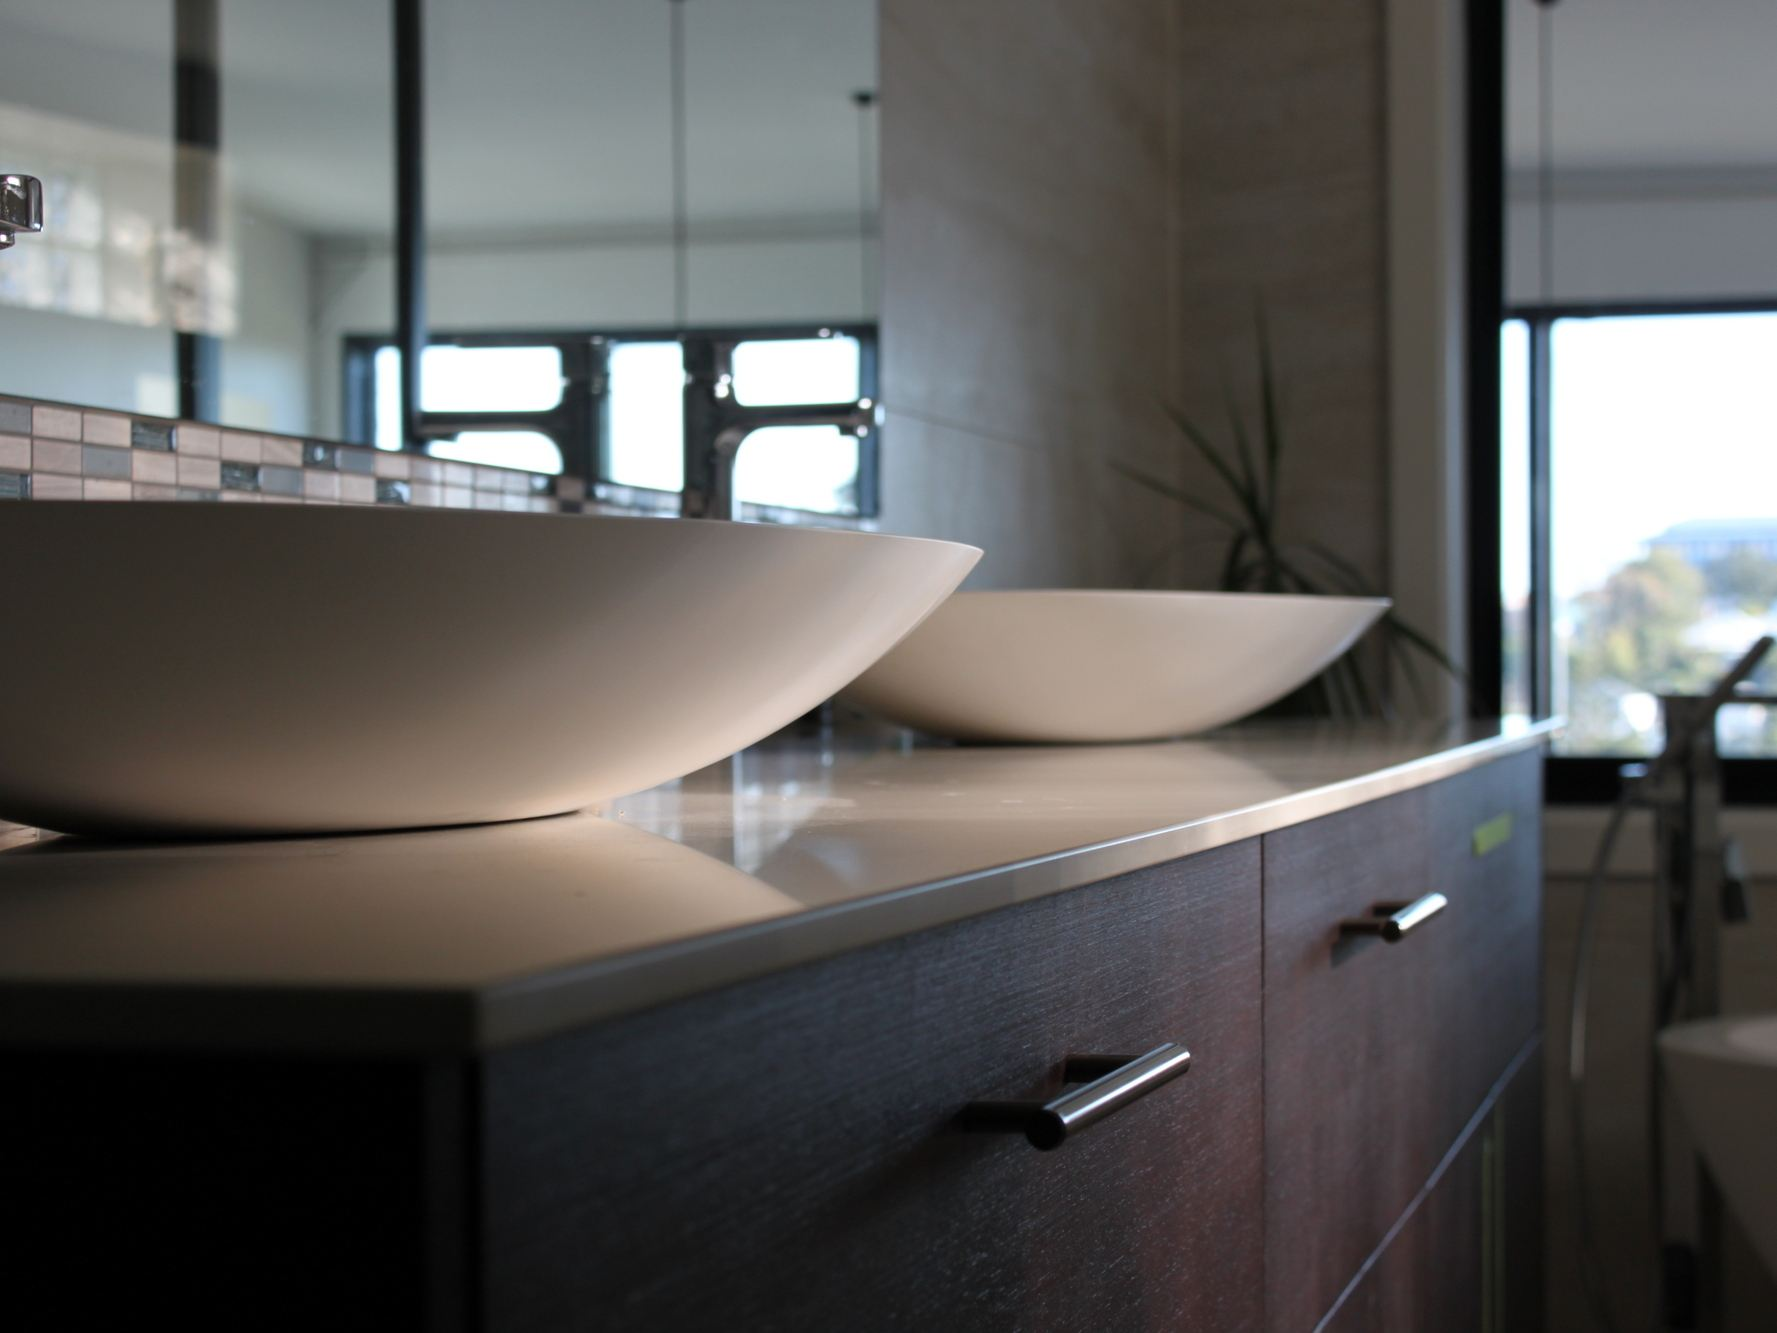 LAPITEC® Piano lavabo by Lapitec